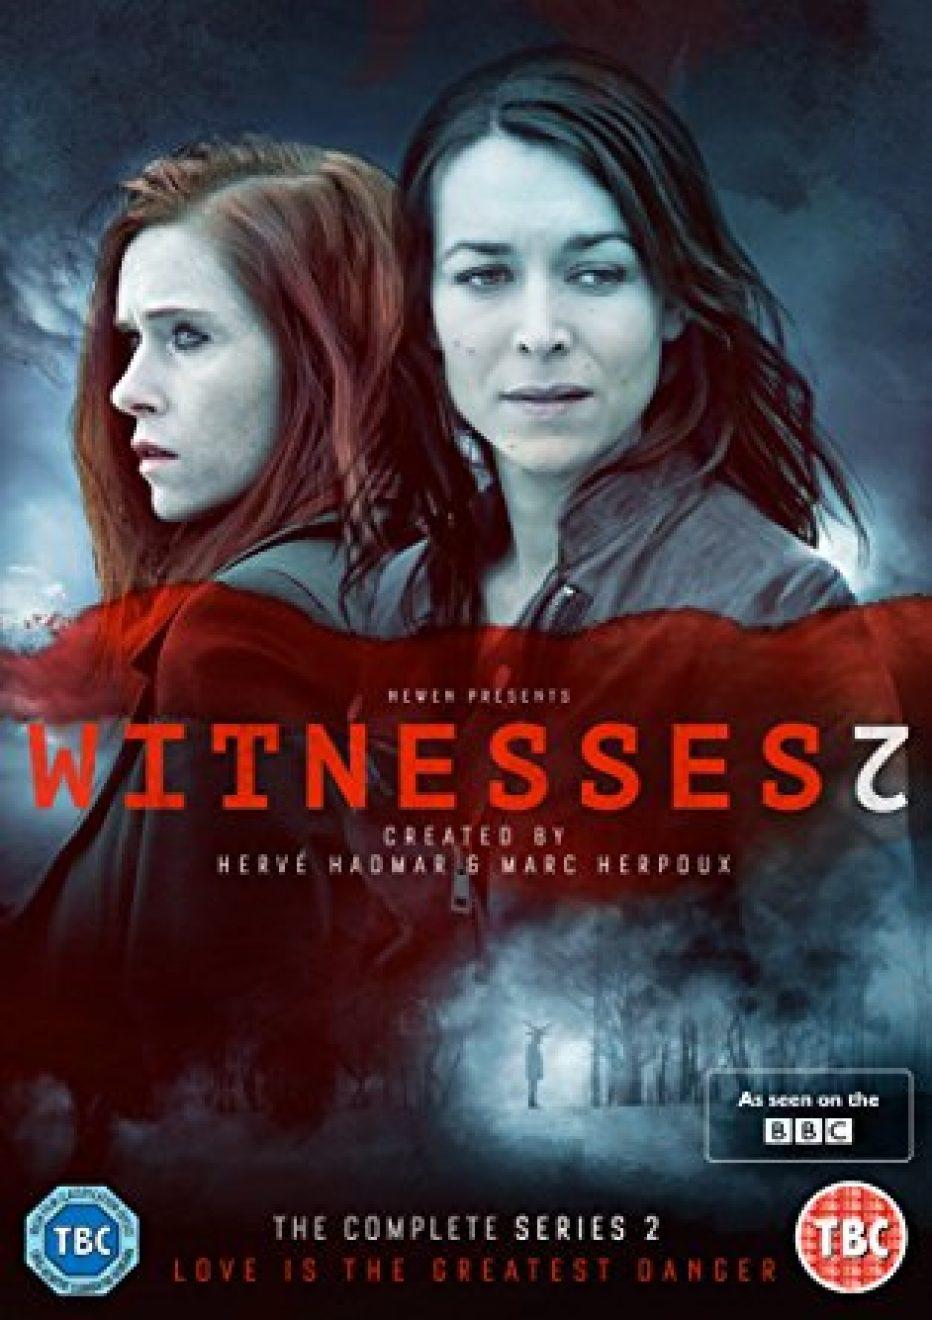 'Witnesses – Frozen Death' DVD & BD released on 15 January 2018